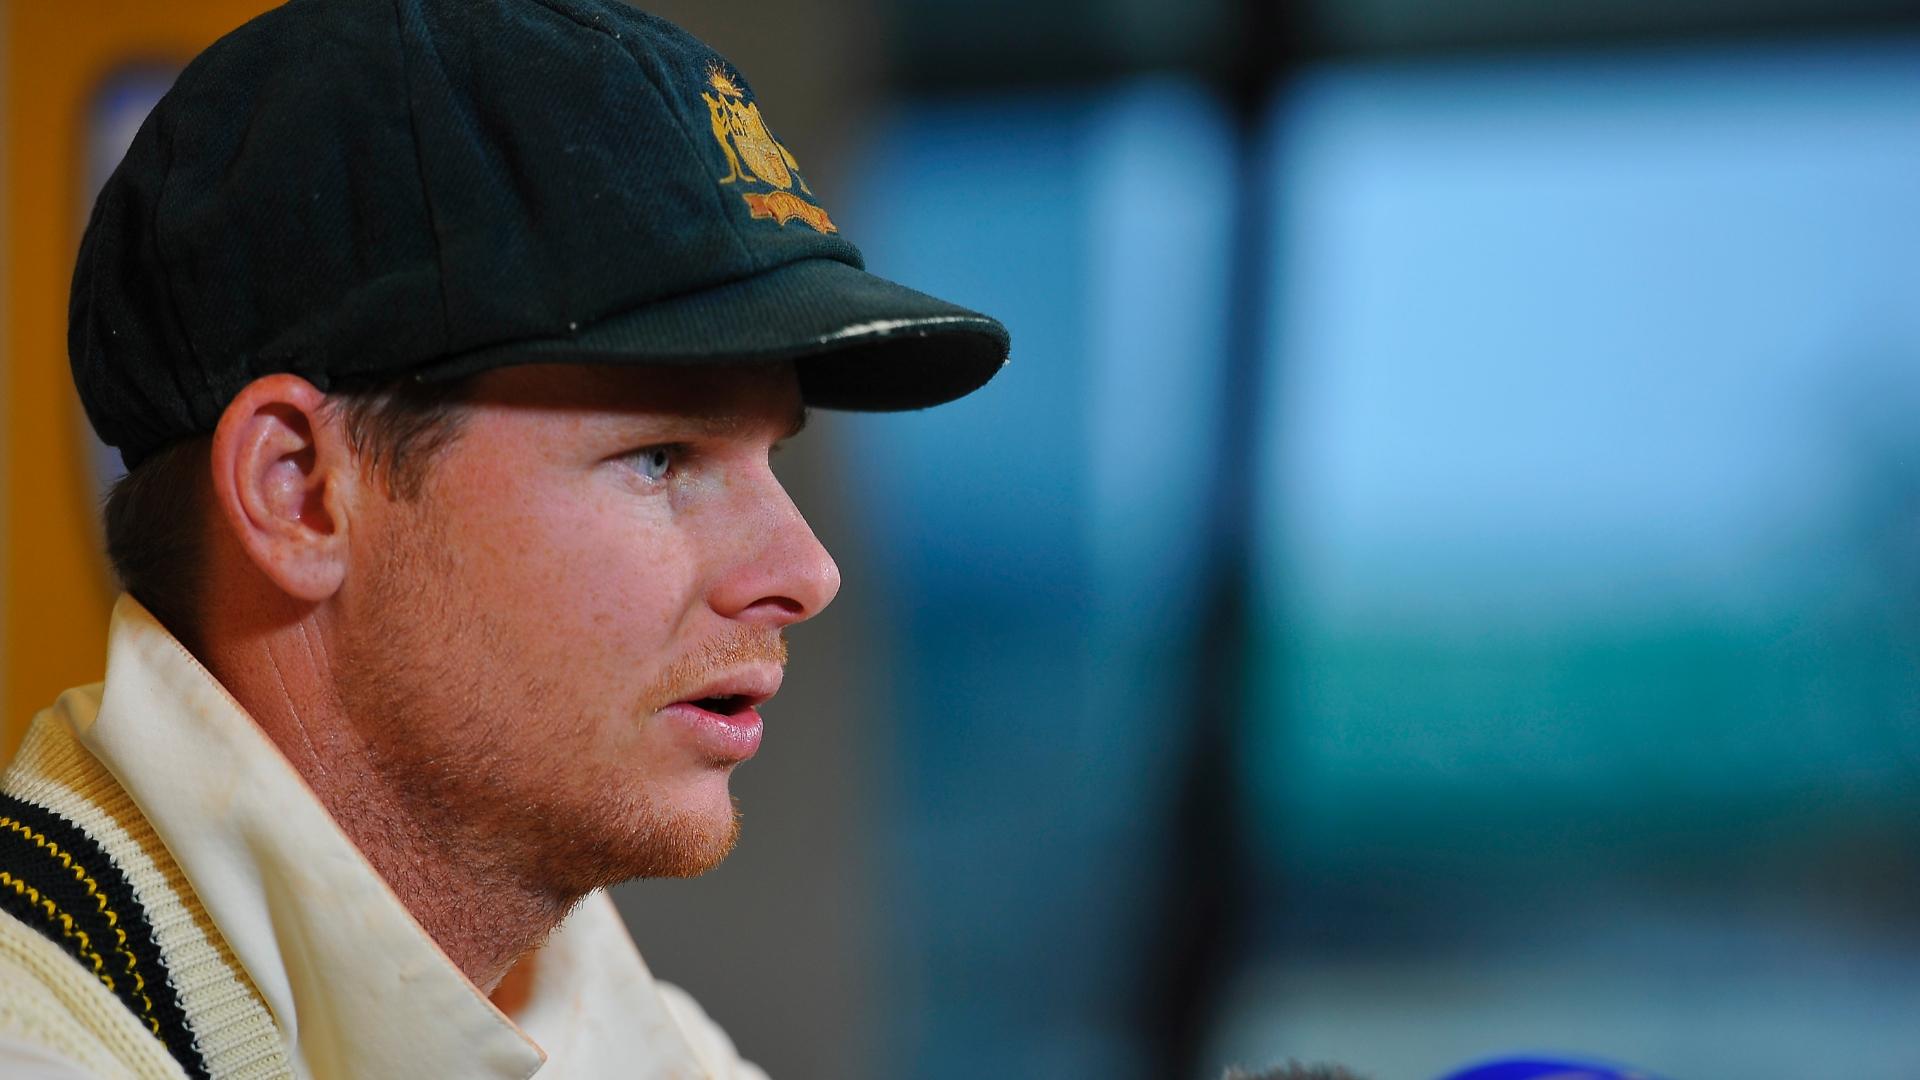 a6764638ba4 Full Scorecard of South Africa vs Australia 3rd Test 2018 - Score Report